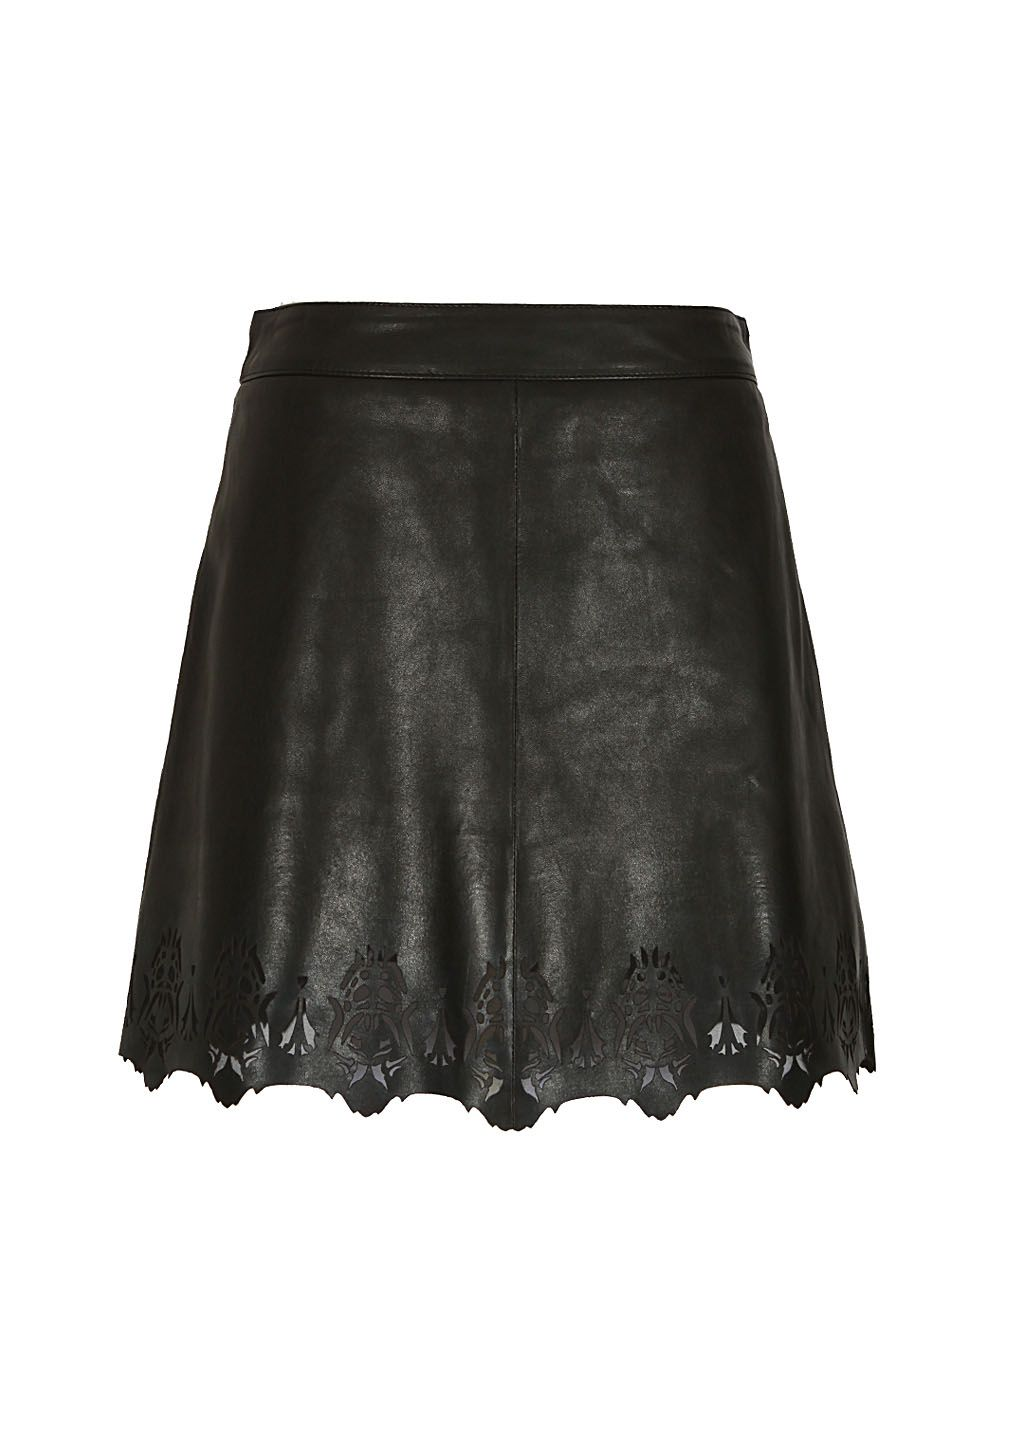 Rag and Bone Skirt :: Rag and Bone black open-leather skirt | Montaigne Market